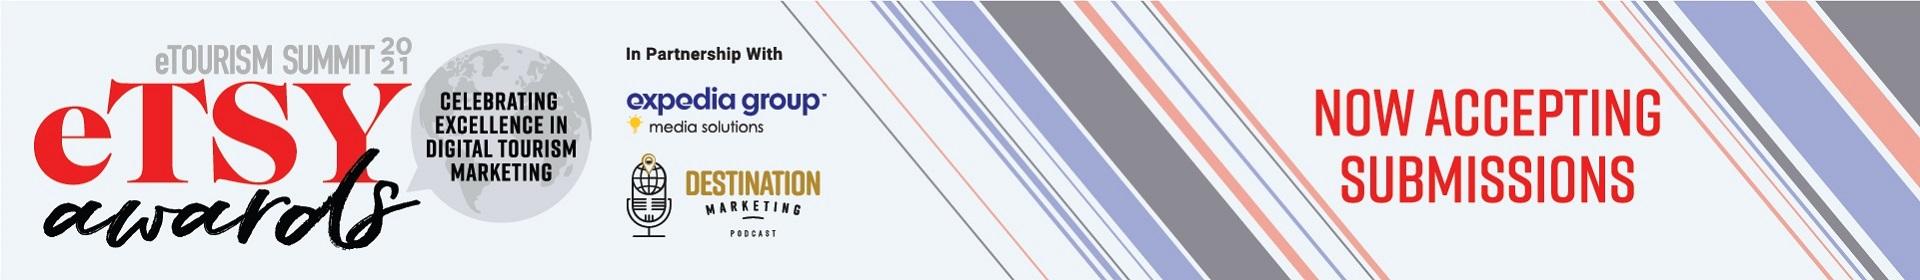 2021 eTSY Awards at eTourism Summit  Event Banner